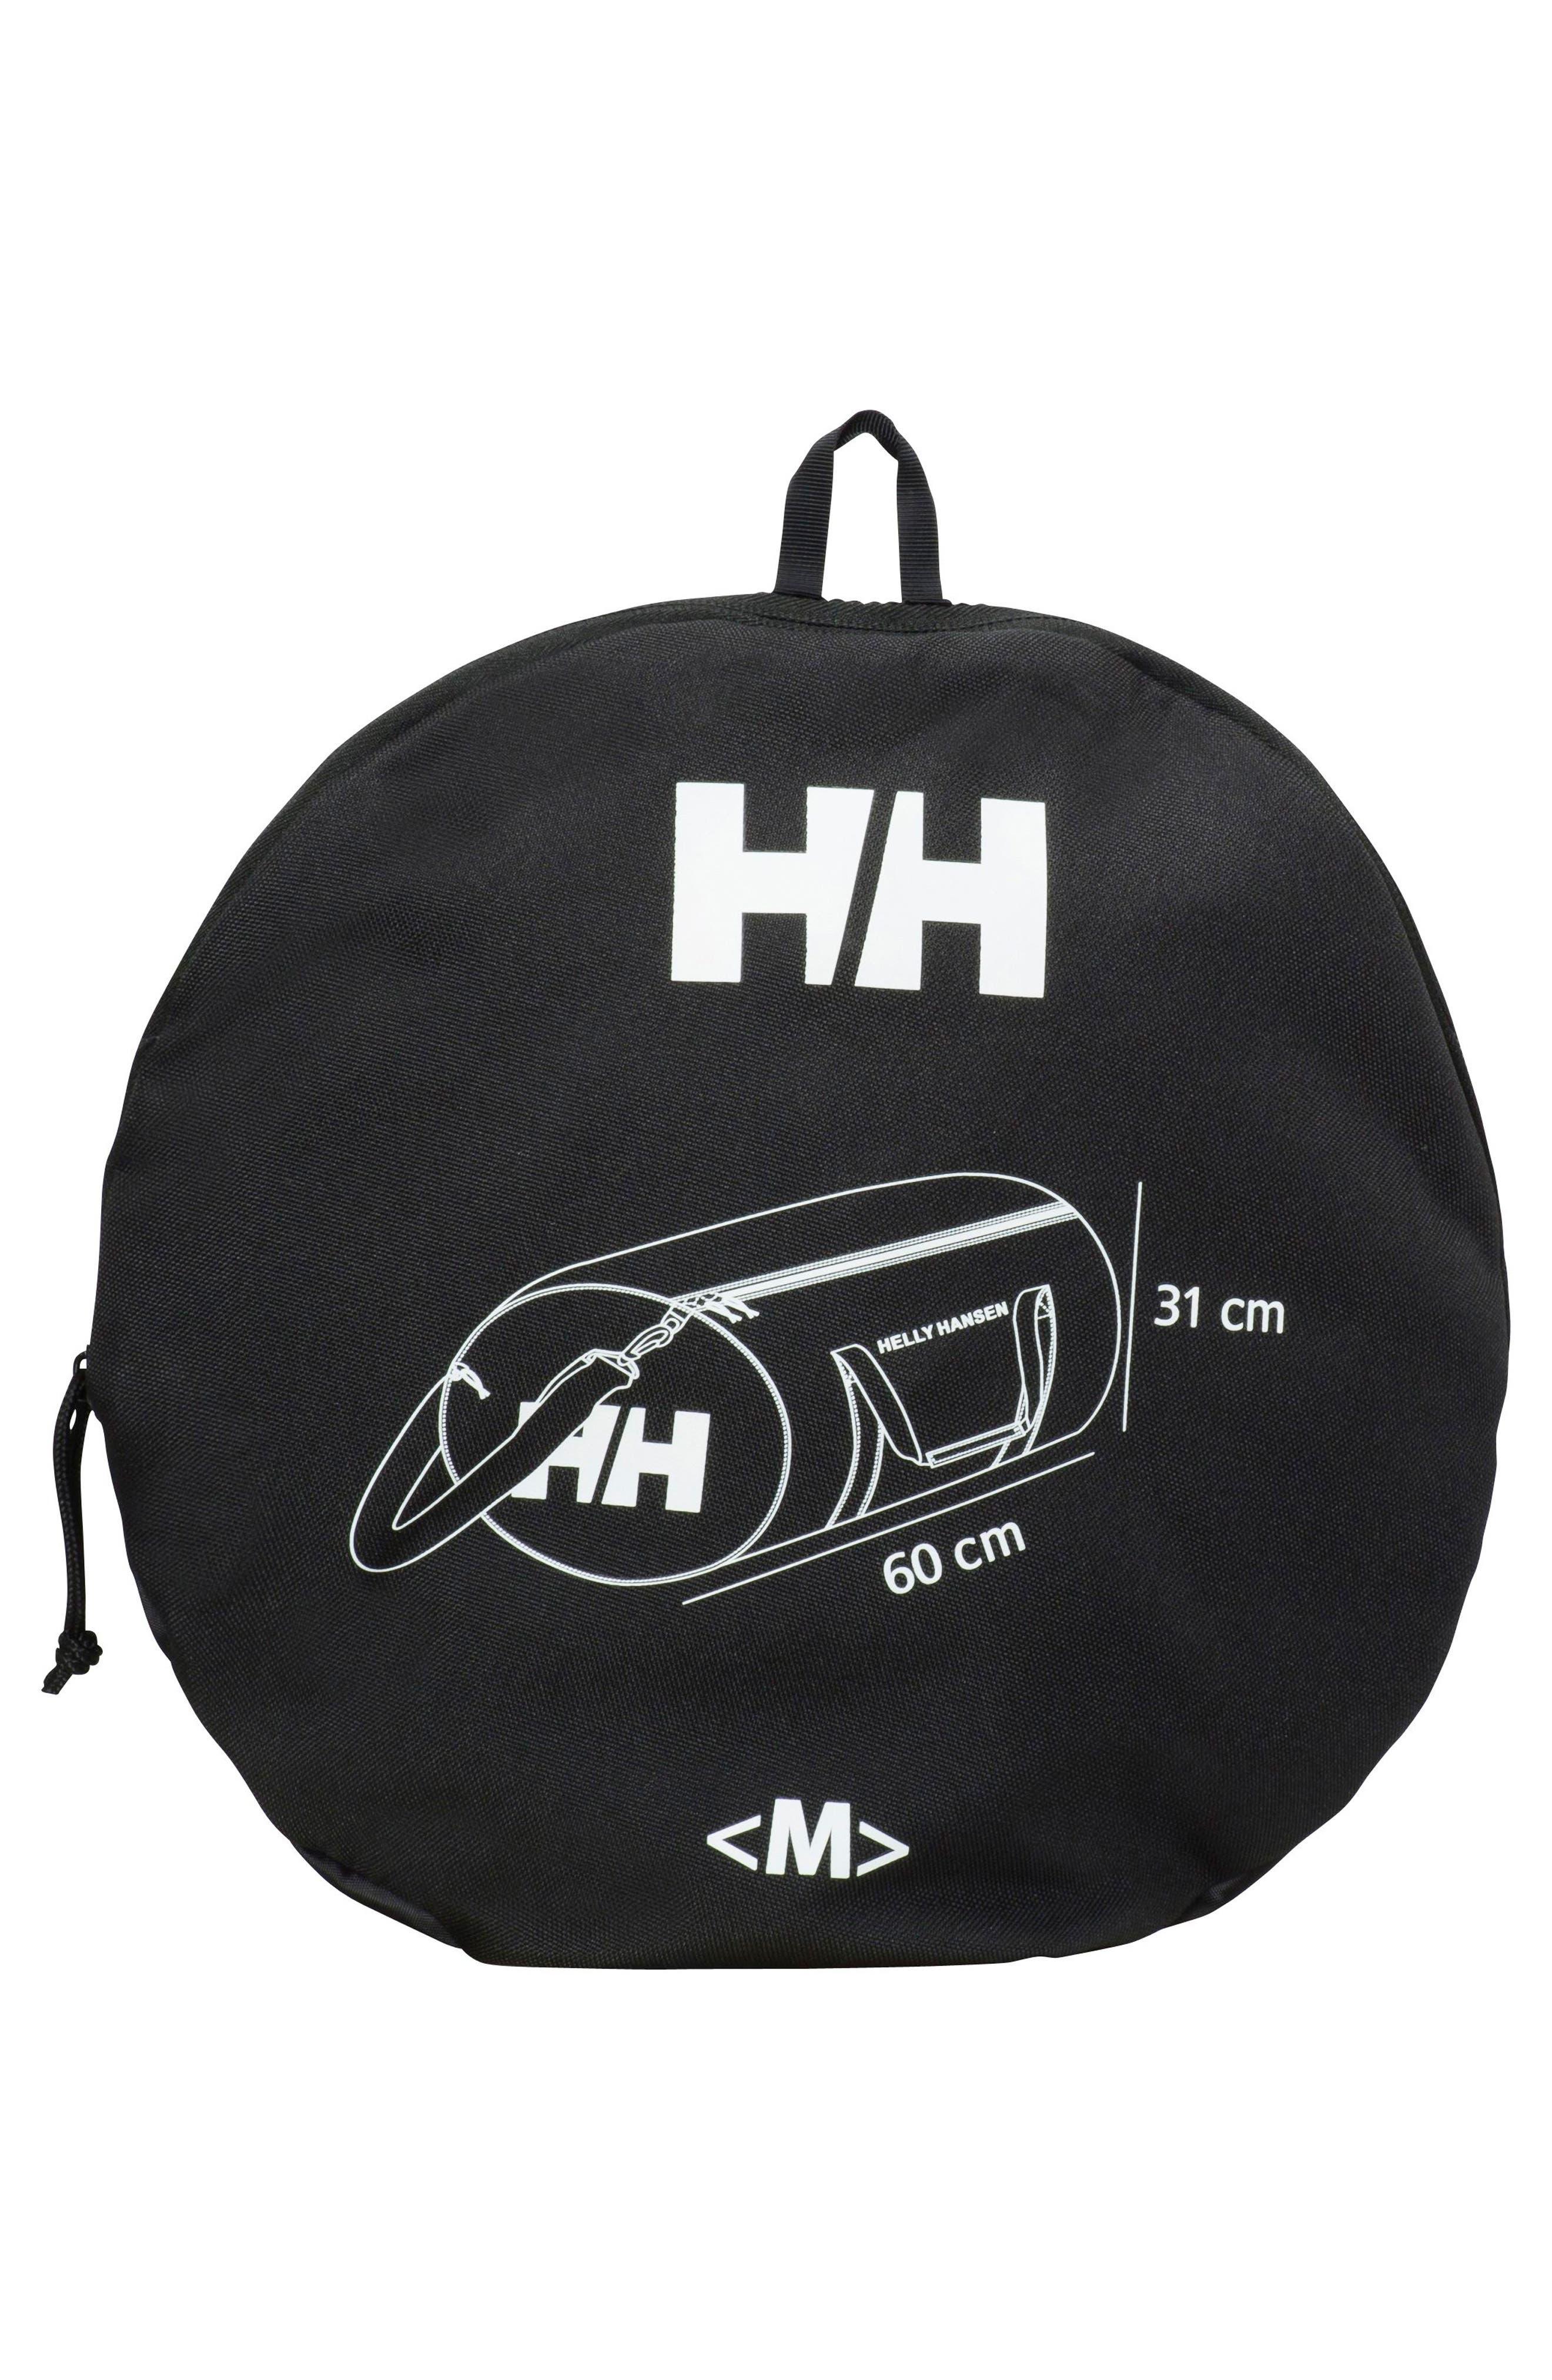 Medium Packable Duffel Bag,                             Alternate thumbnail 2, color,                             009